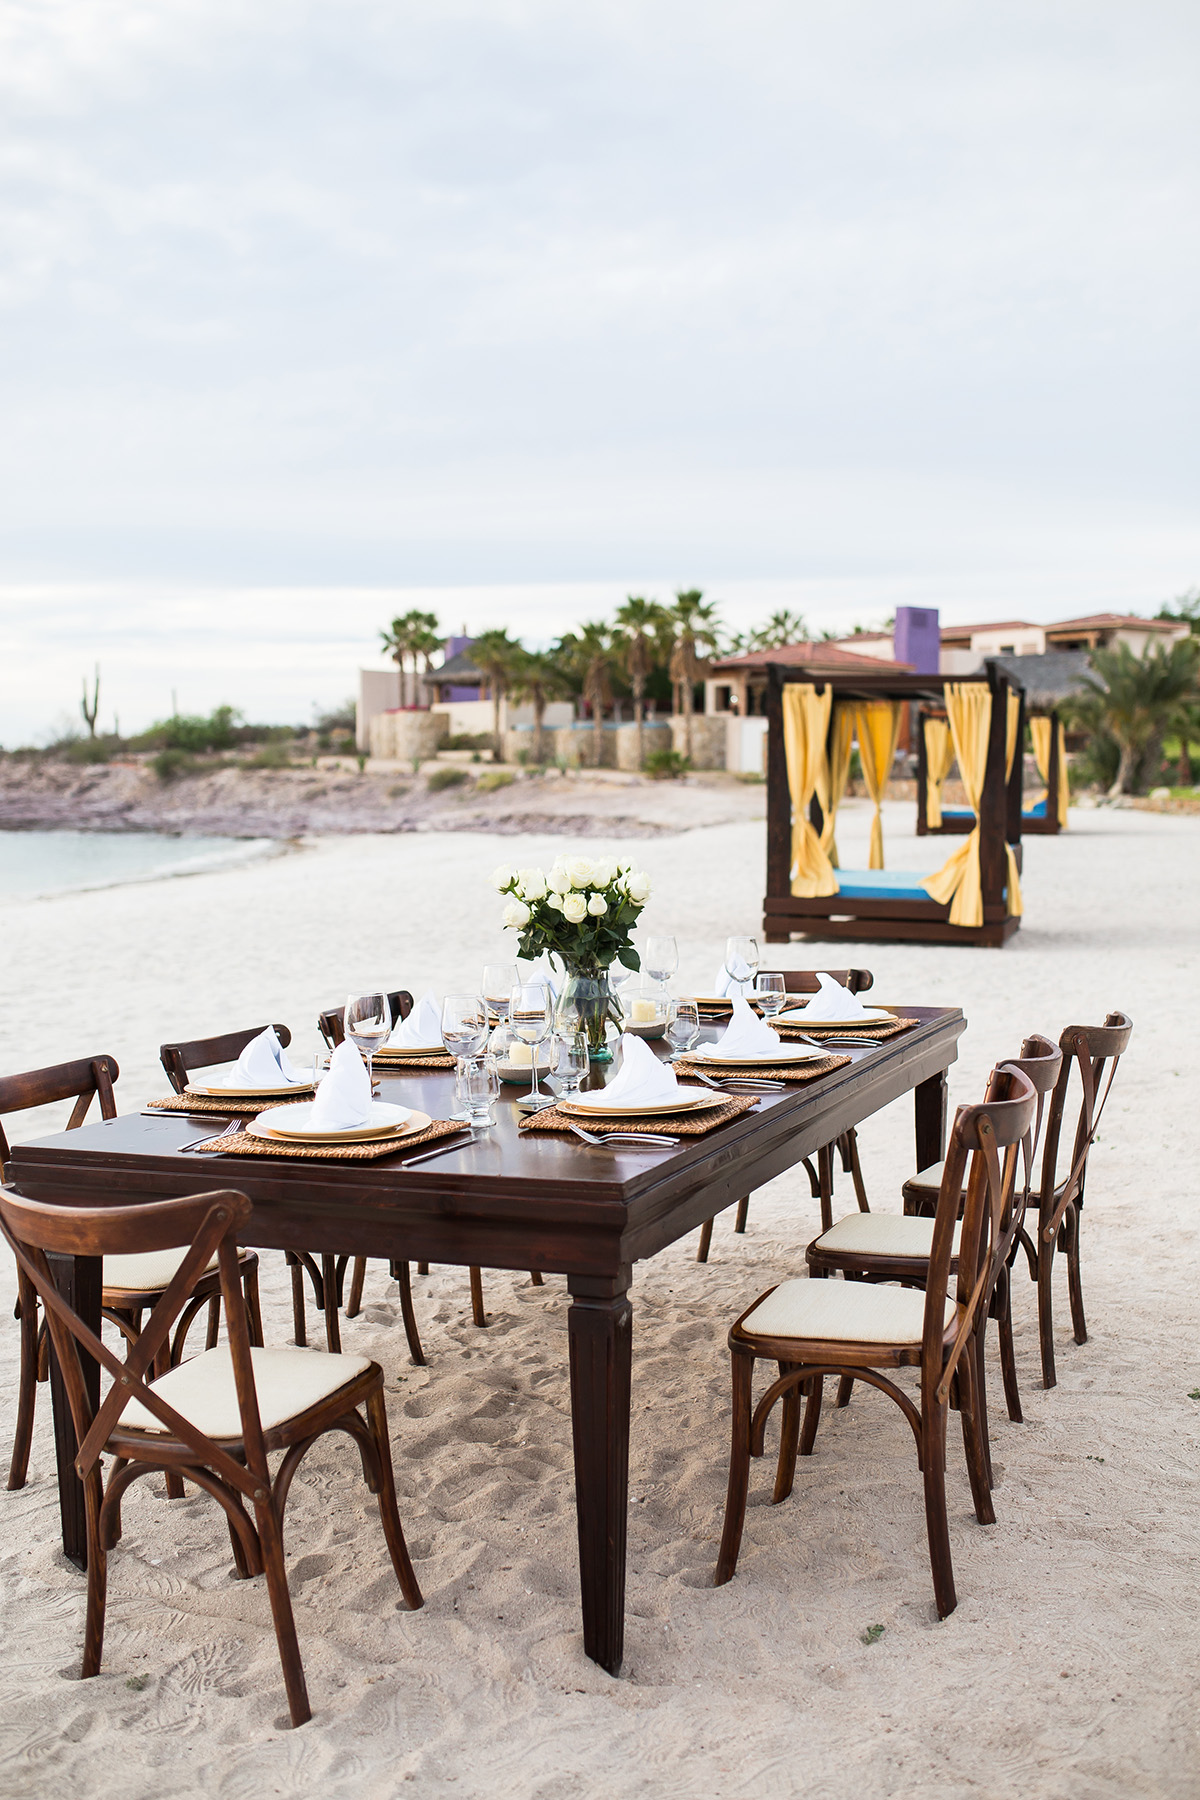 Playa de la Paz recap | La Paz Mexico